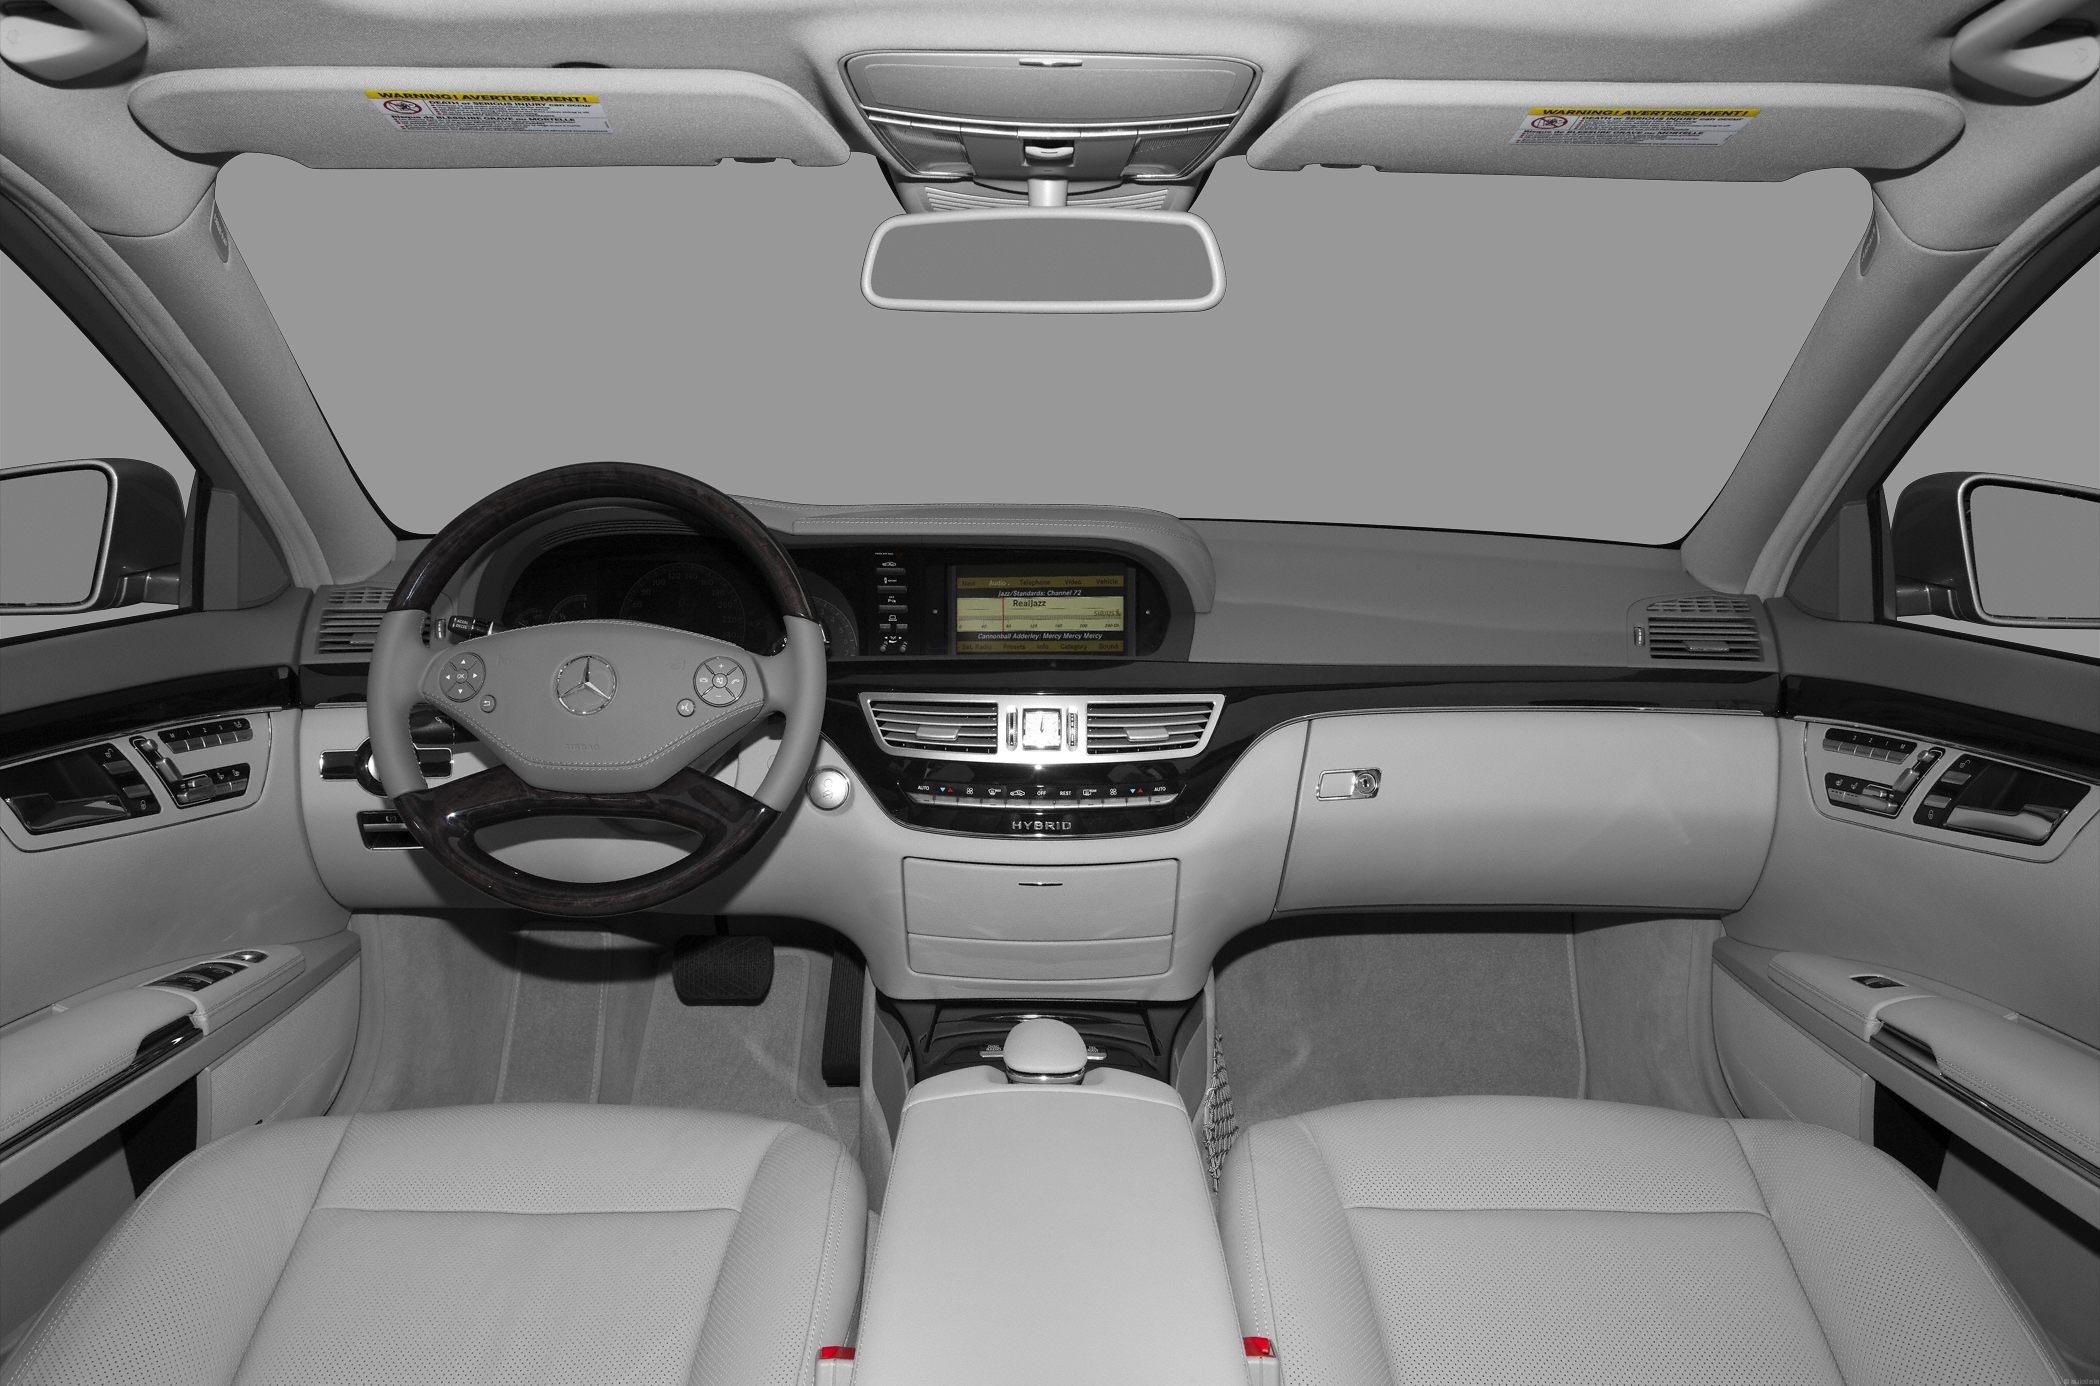 mercedes invoice price 2015 mercedes s400 bluetec hybrid price in india 2100 X 1386